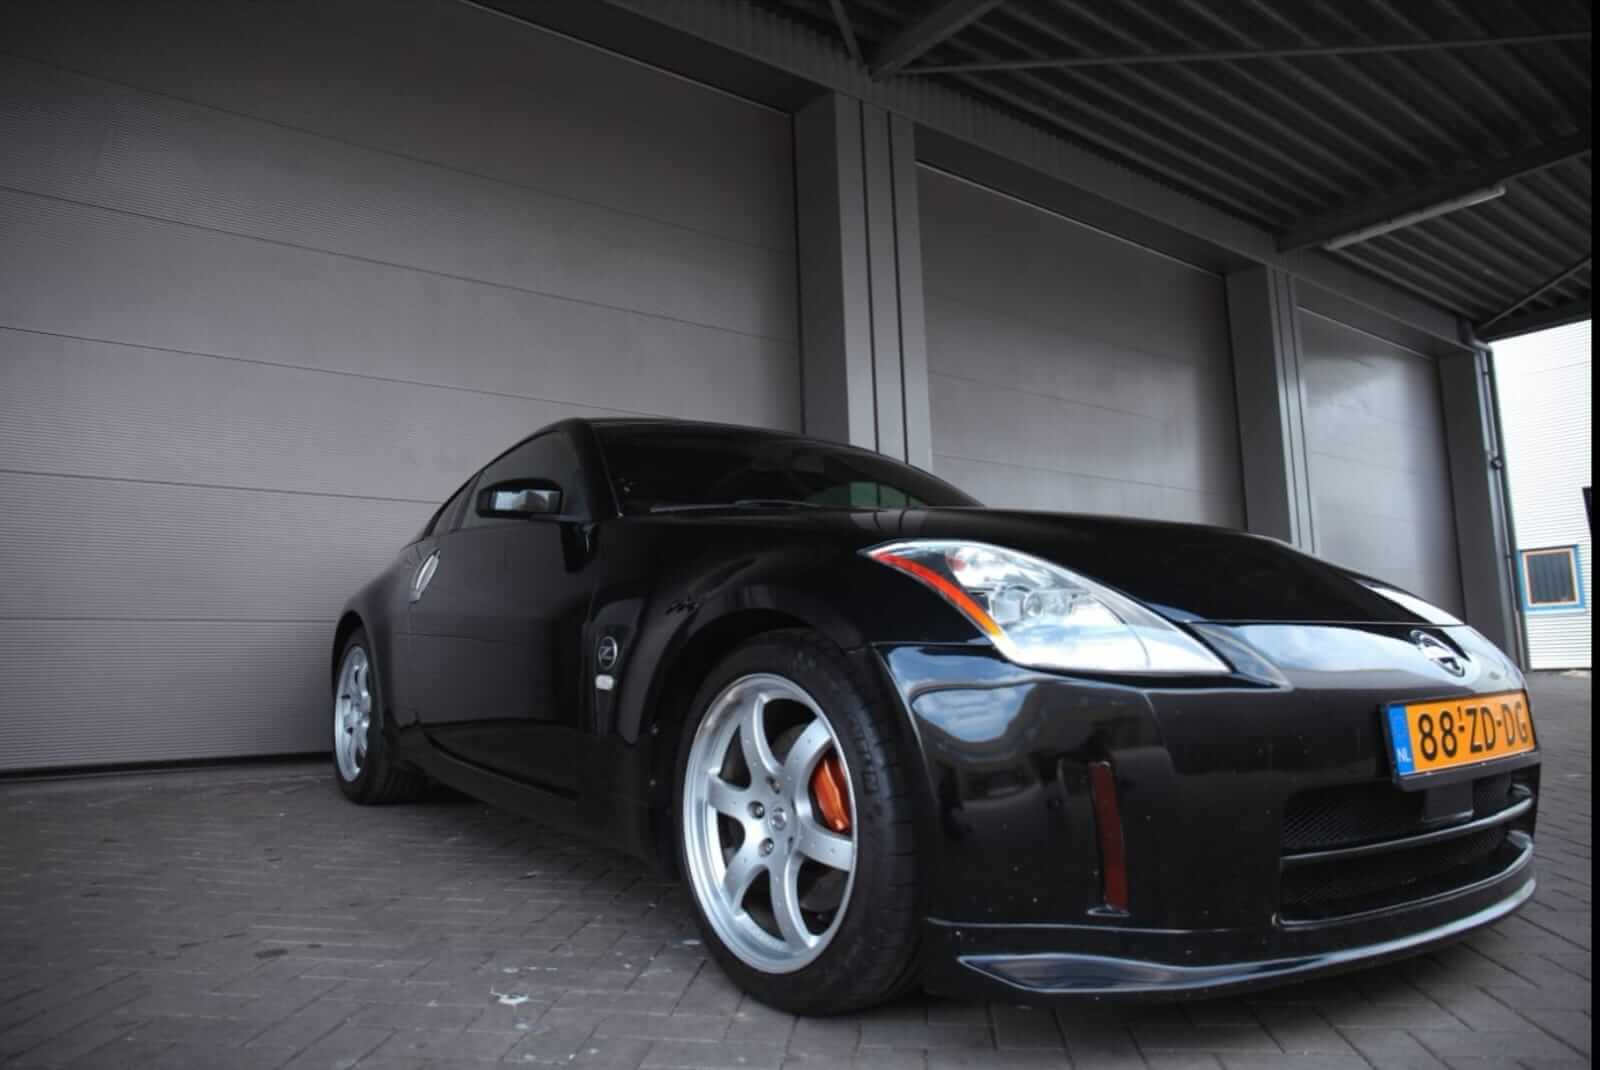 Nissan 350Z HR Track Edition 2008 front side – by Next Level Automotive – Go to nextlevelautomotive.eu